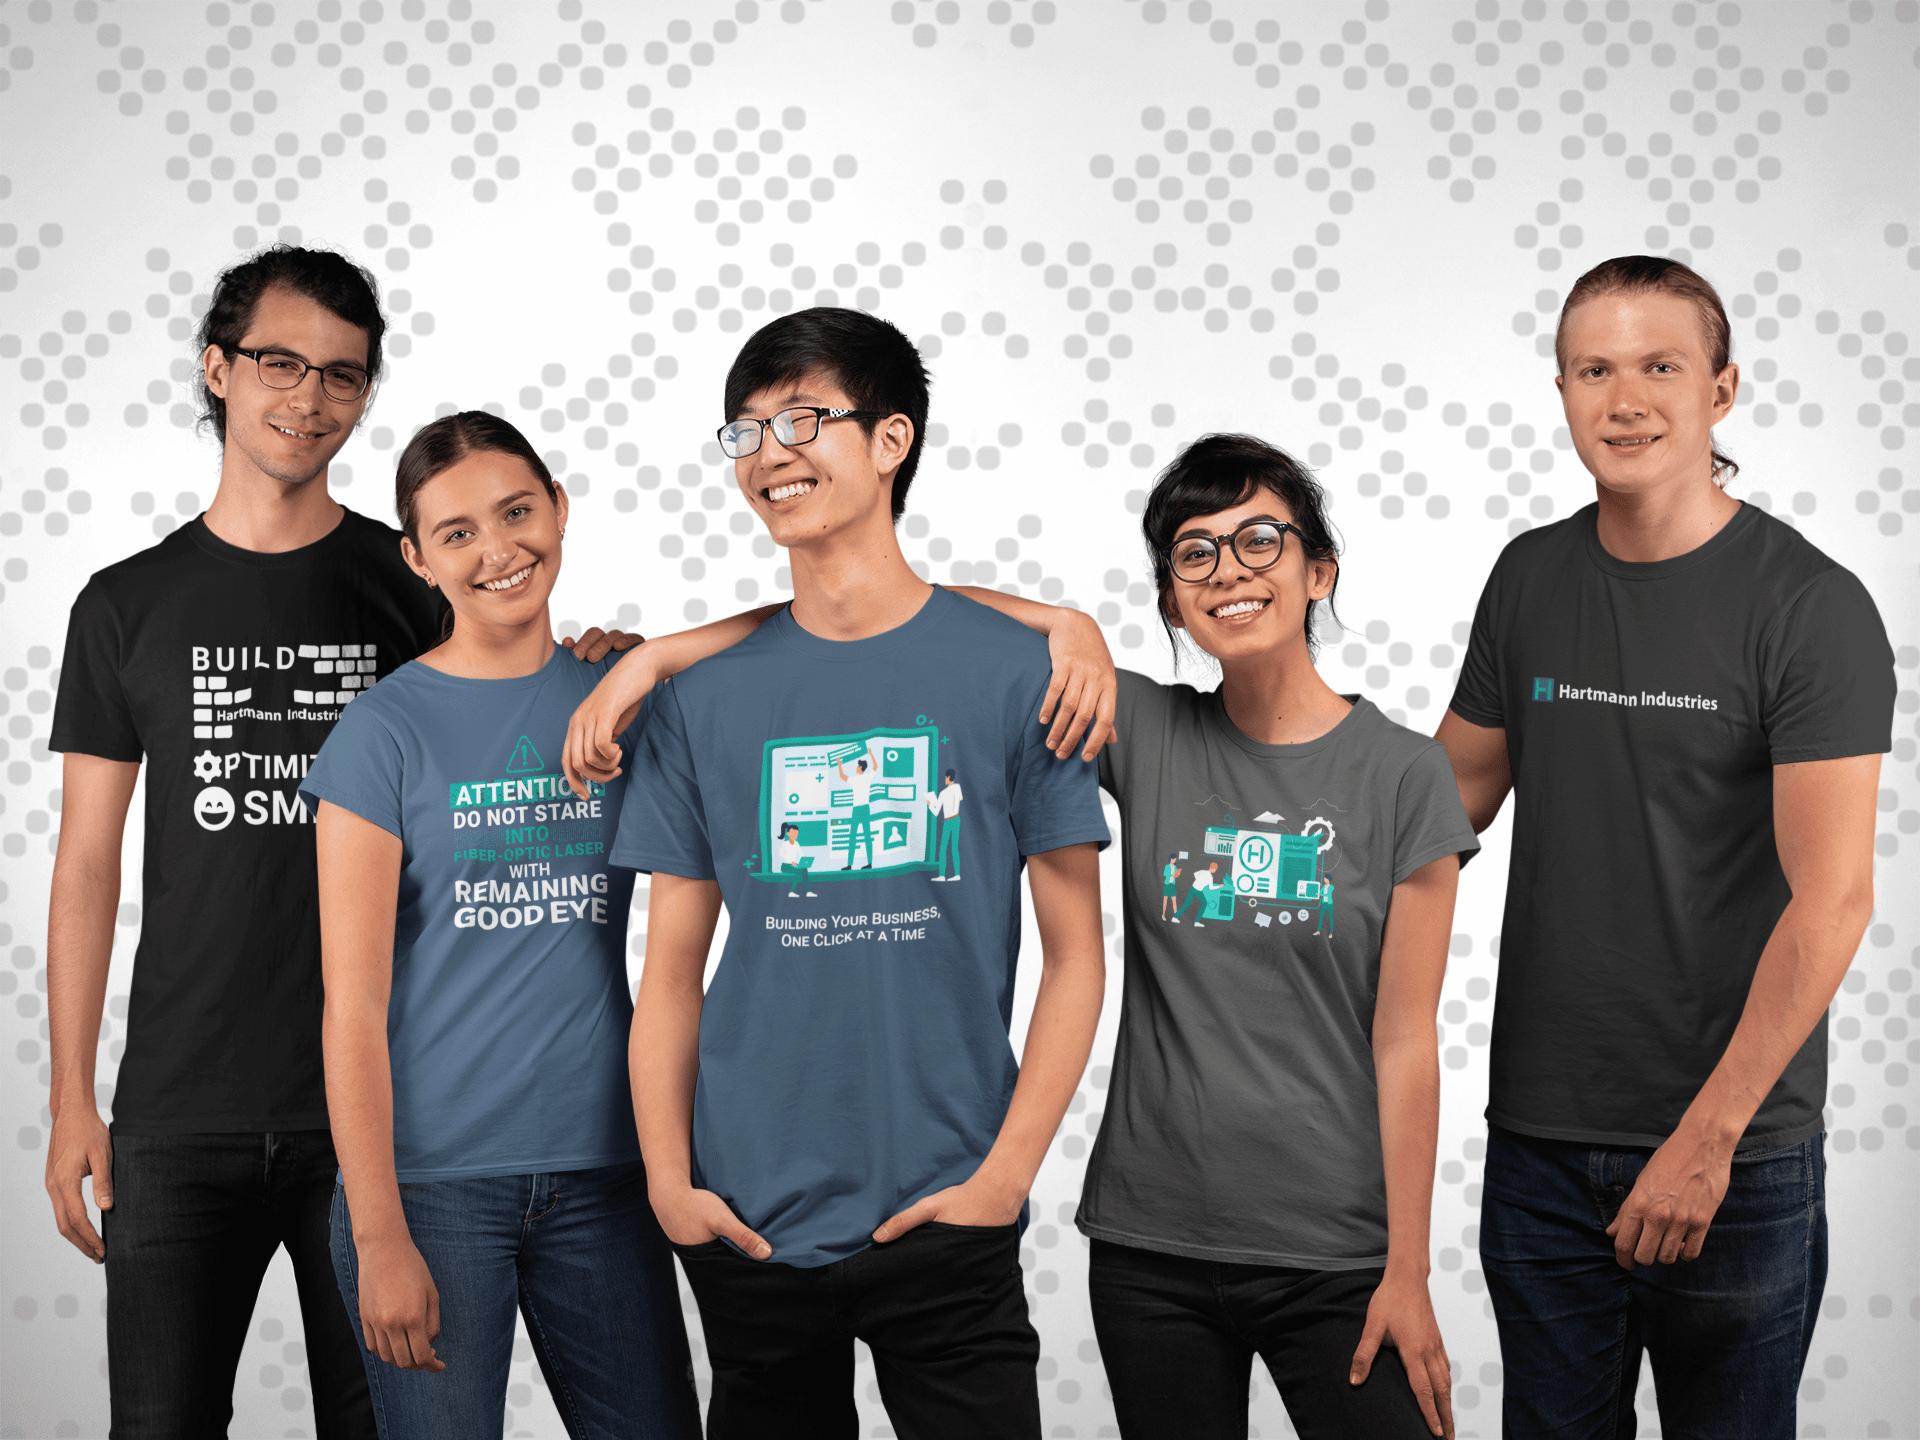 Five people wearing Hartmann Industries t-shirts